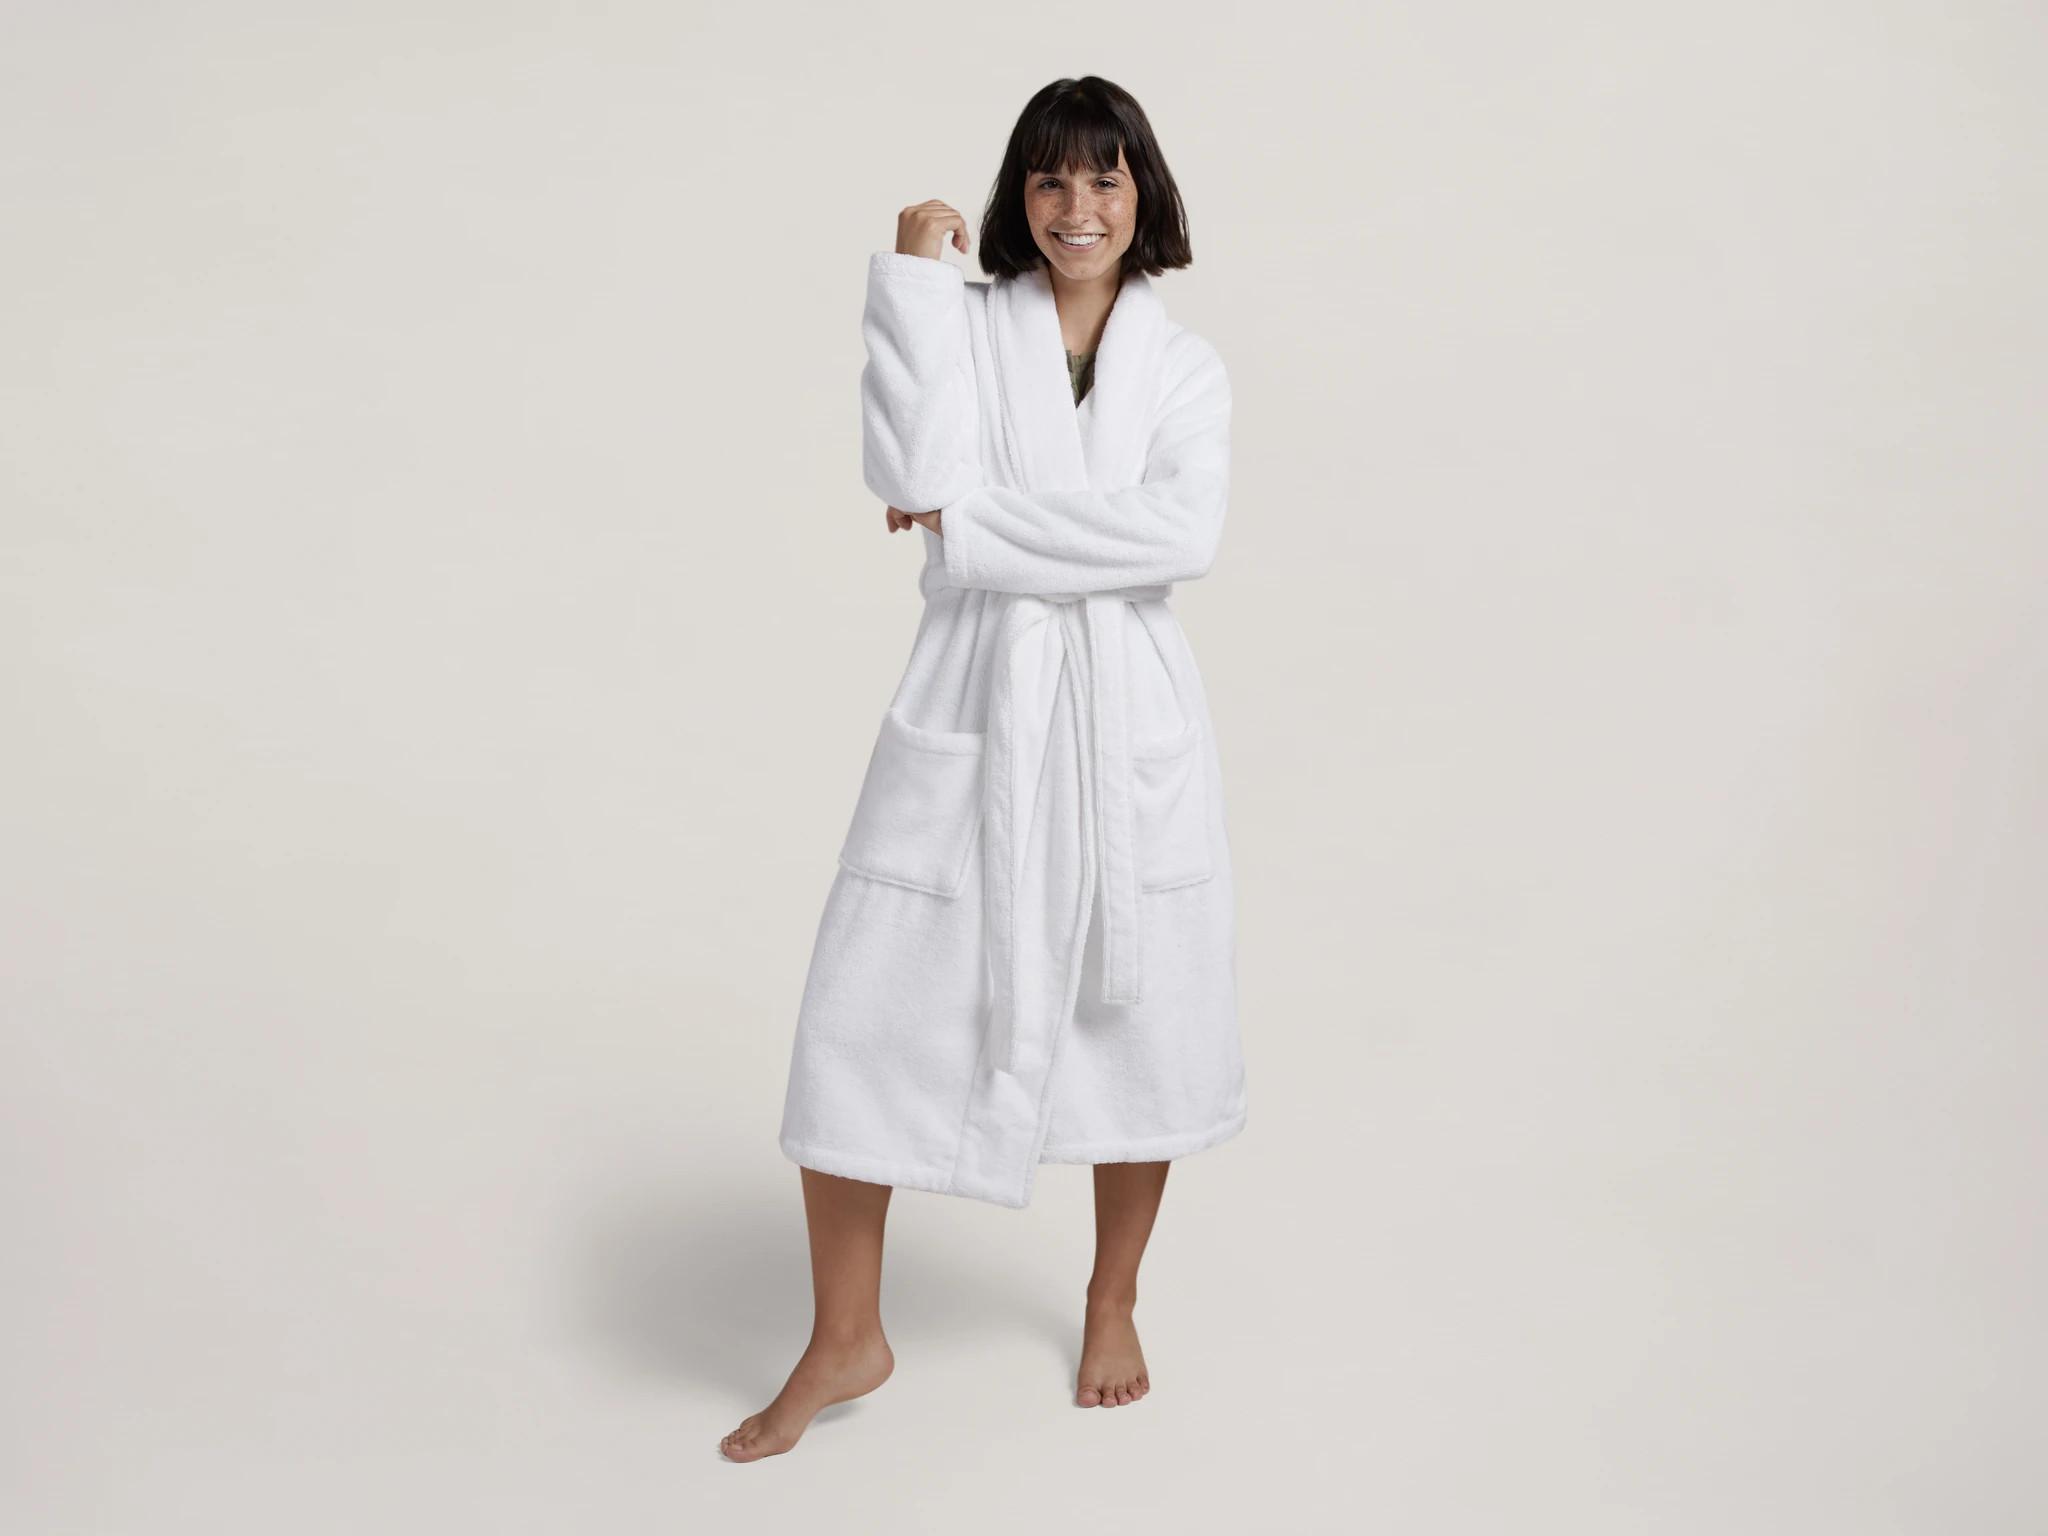 get a good robe